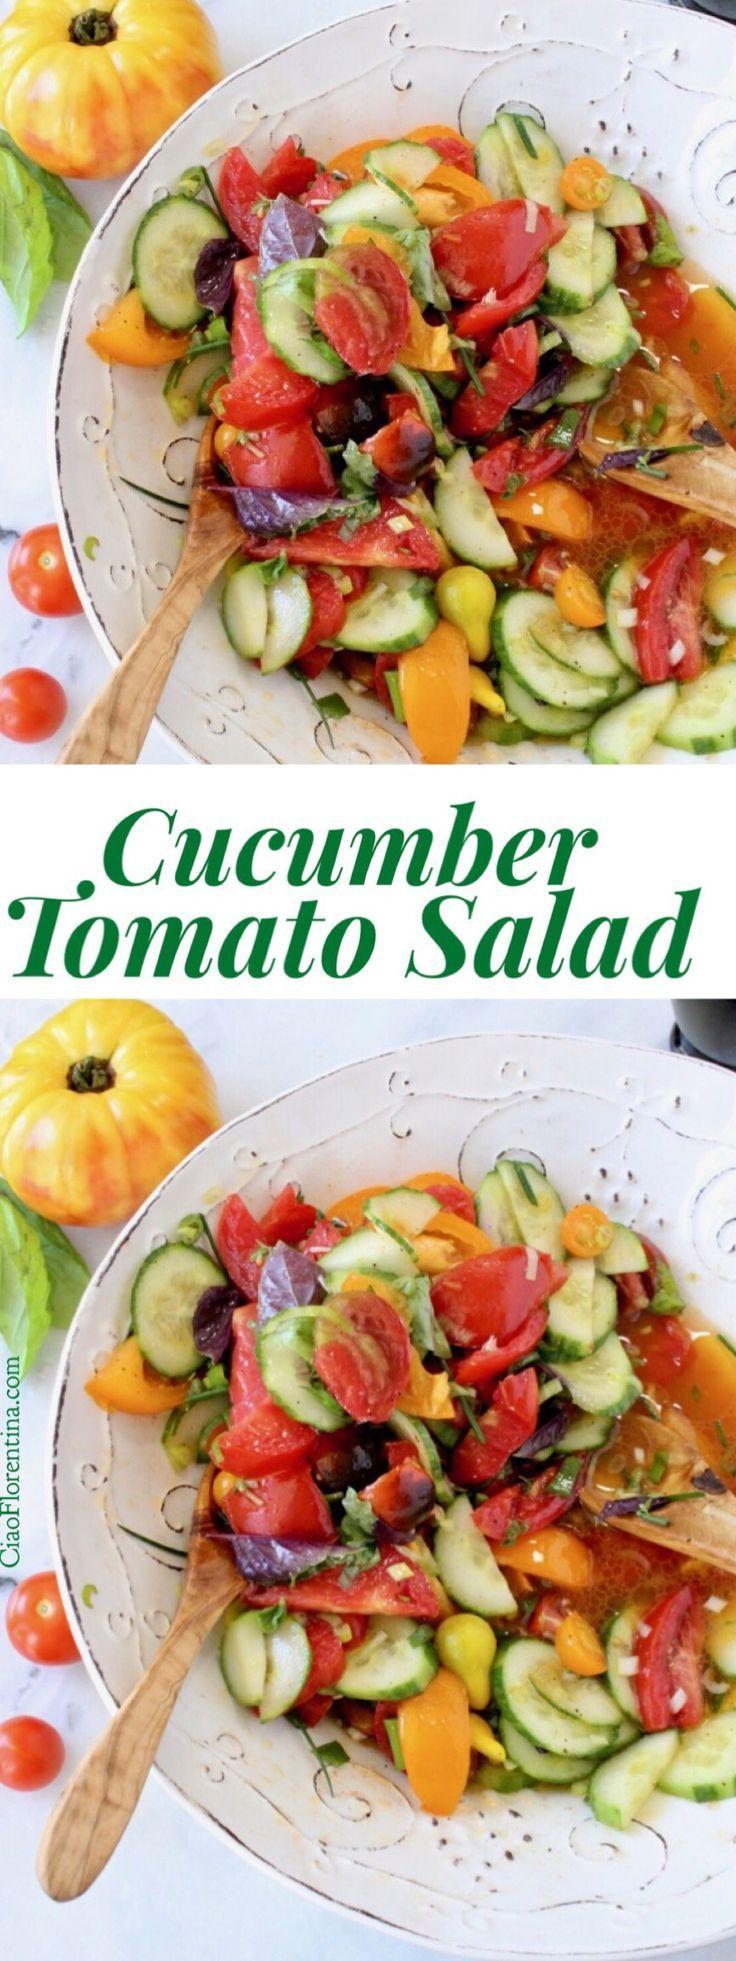 Cucumber Tomato Salad Recipe Video with Olive Oil and Vinegar | CiaoFlorentina.com @CiaoFlorentina